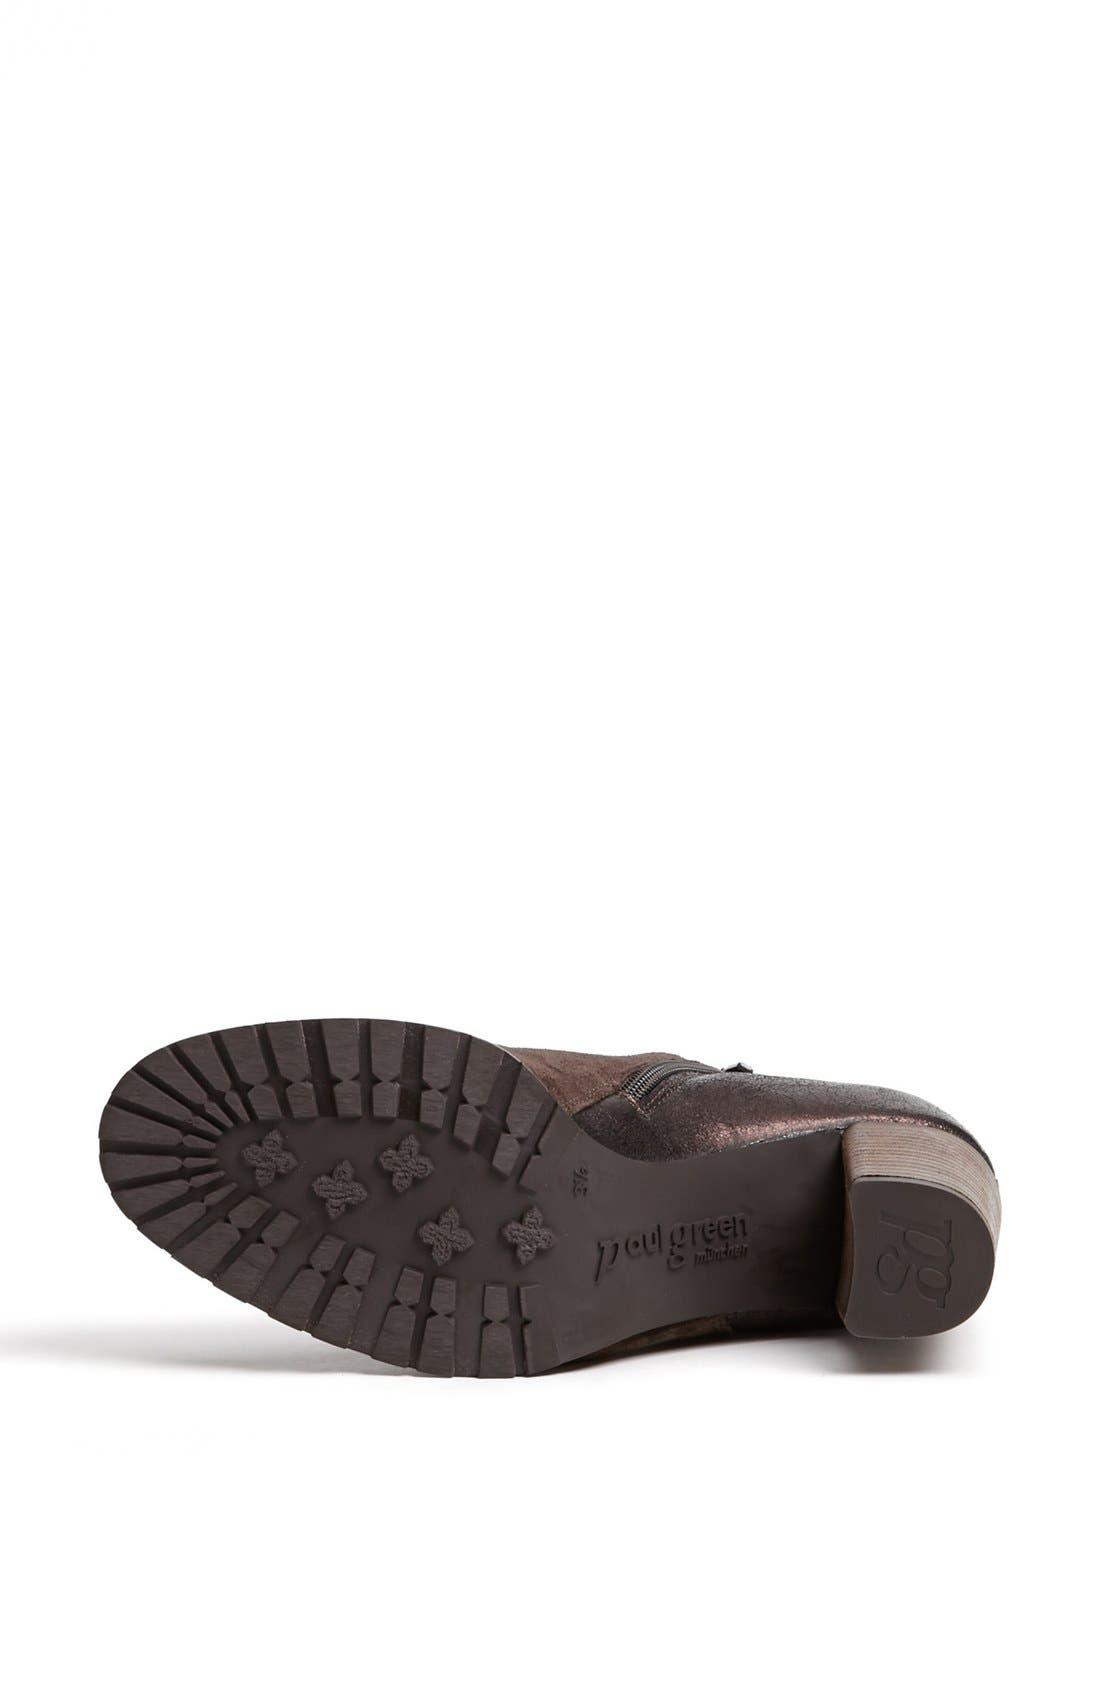 Alternate Image 4  - Paul Green 'Rockin' Boot